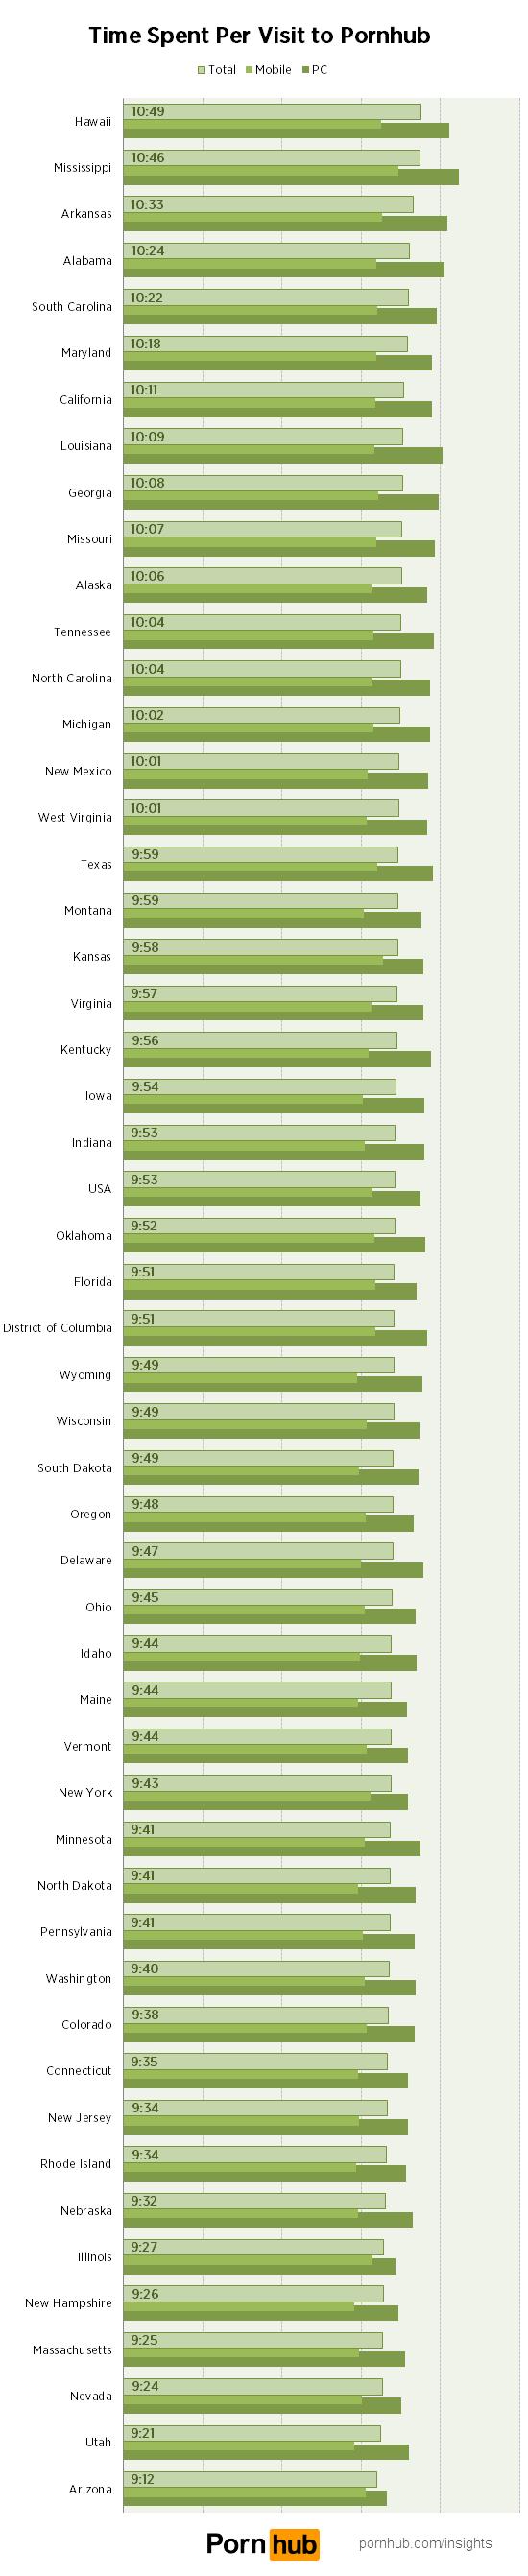 us-states-visit-duration